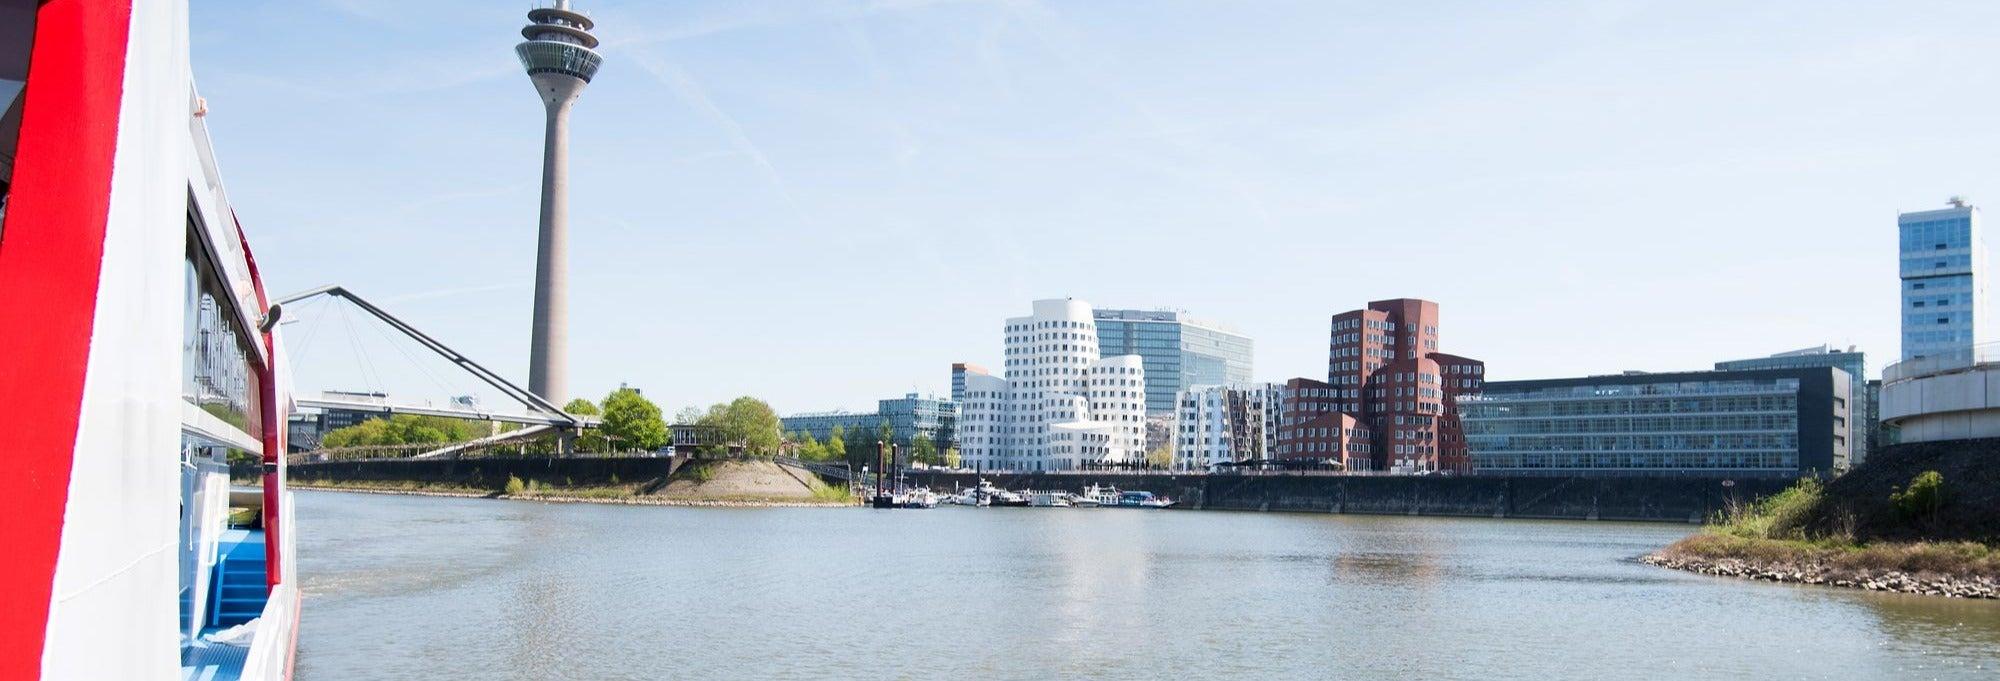 Balade en bateau dans Düsseldorf